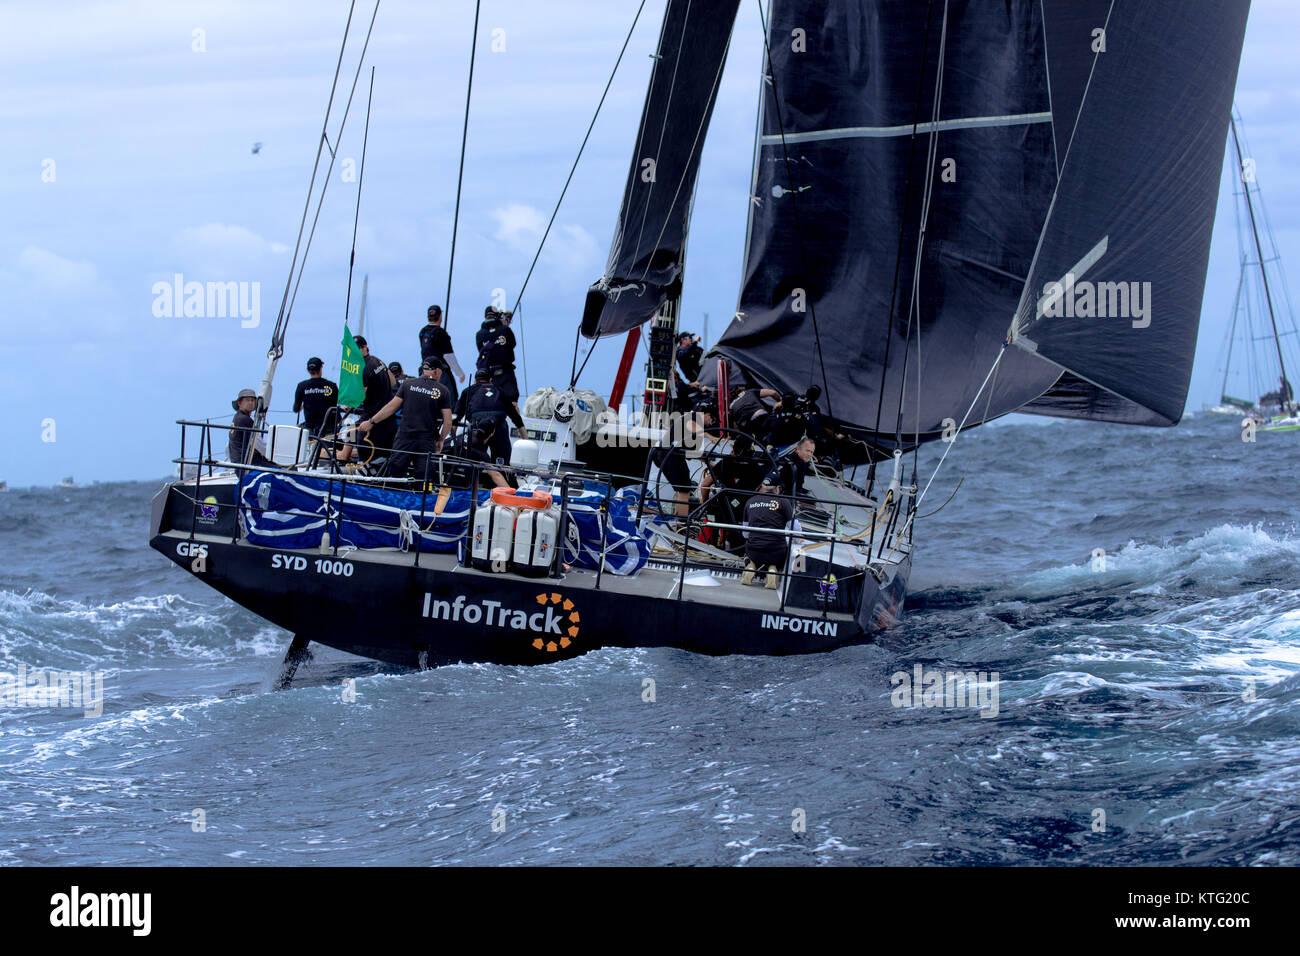 Sydney, Australia. 26th December 2017. Rolex Sydney to Hobart Yacht Race 2017. InfoTrack being skippered by Tom - Stock Image